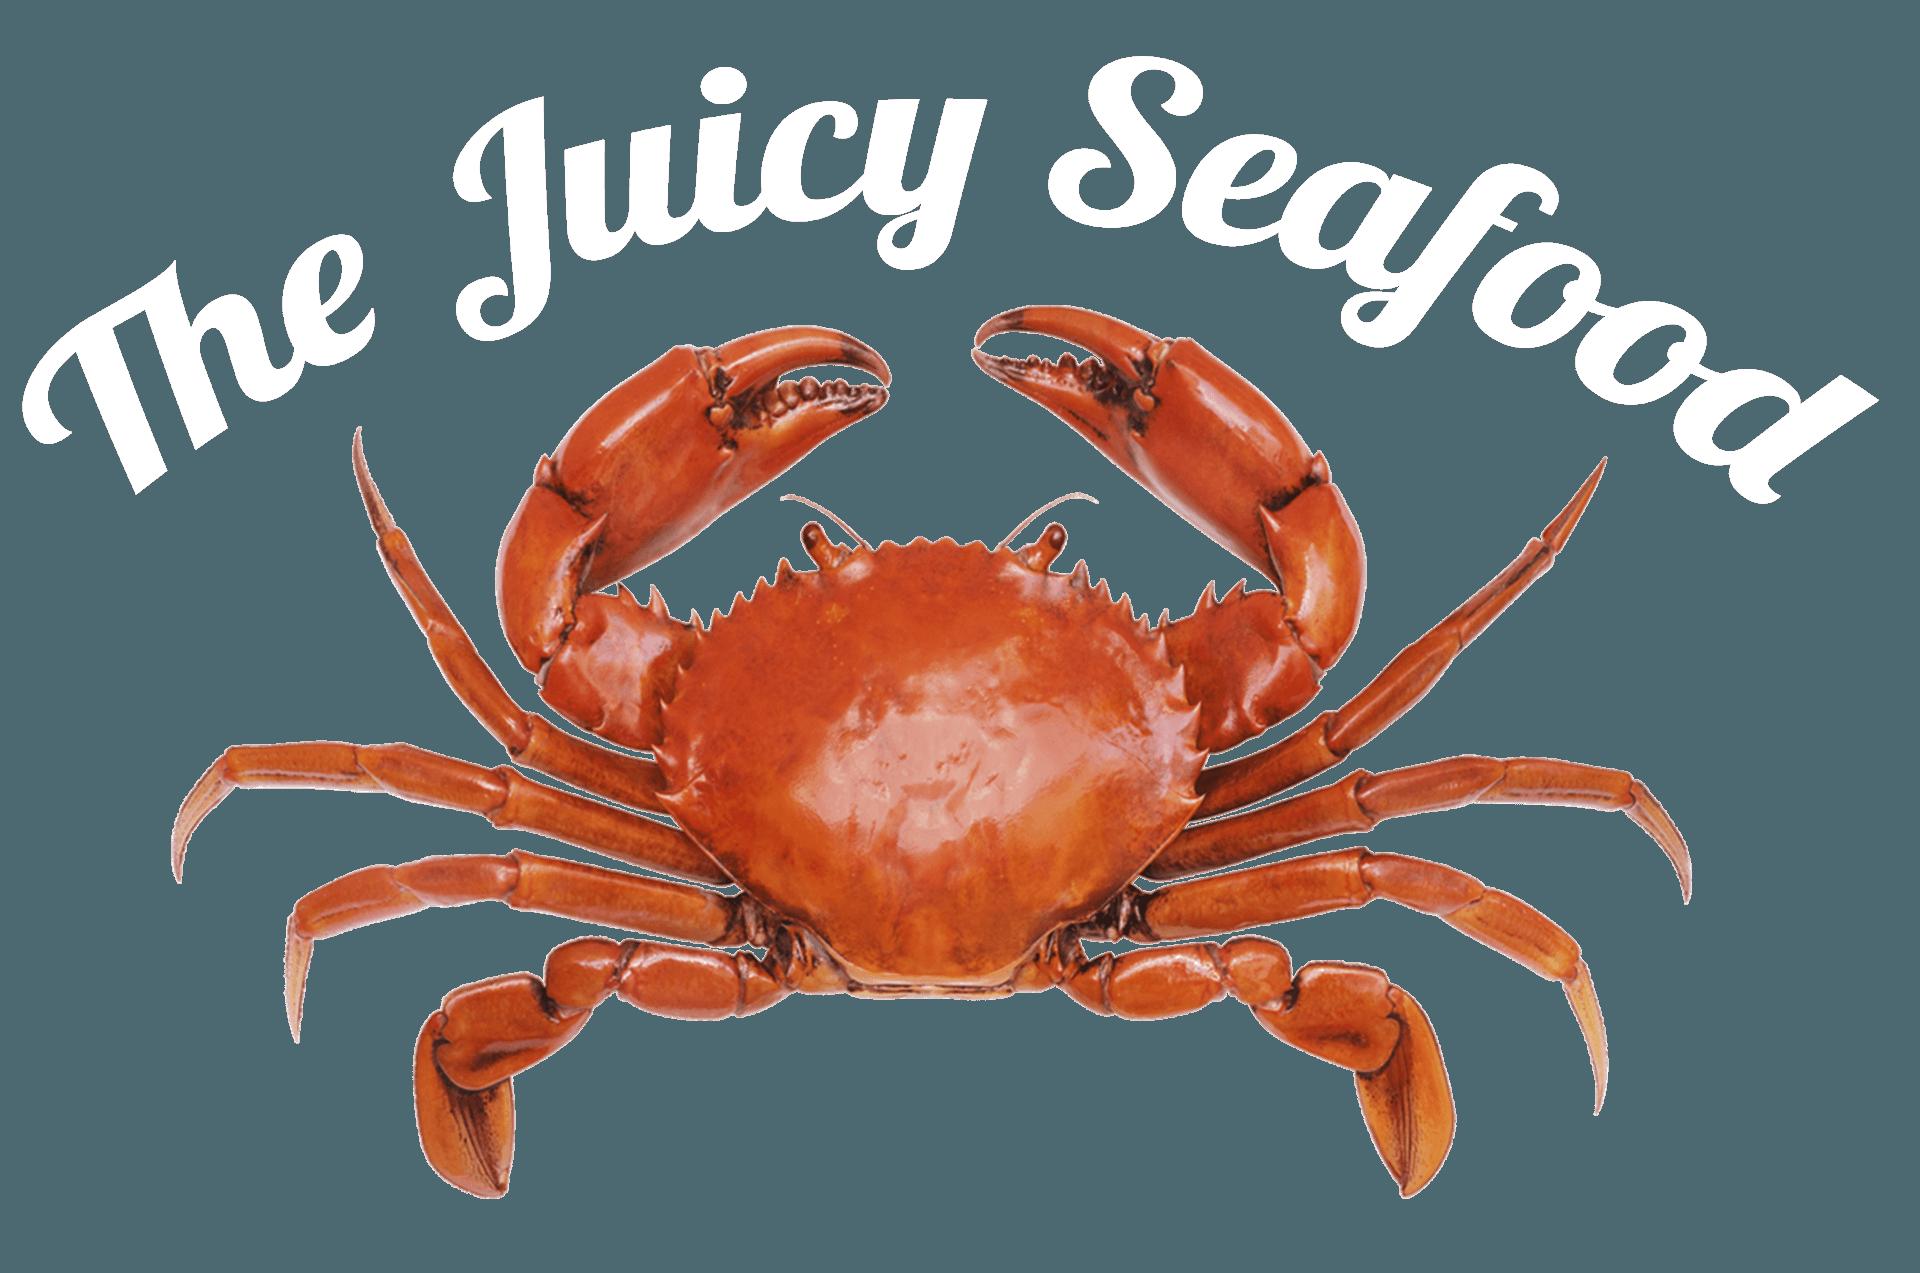 Crabs clipart seafood restaurant, Crabs seafood restaurant.